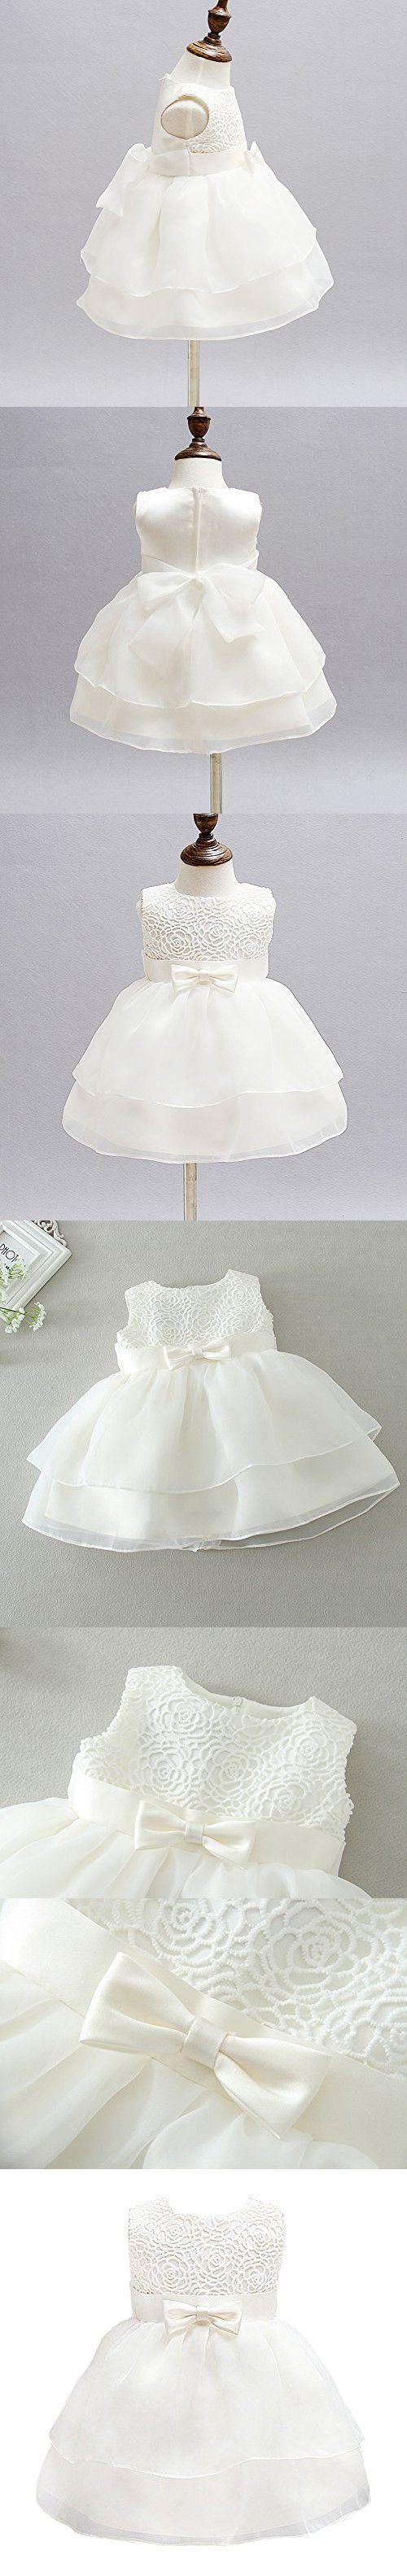 d4b9b989e Dream Rover Baby Girl Dress Cristening Baptism Special Occasion Dress